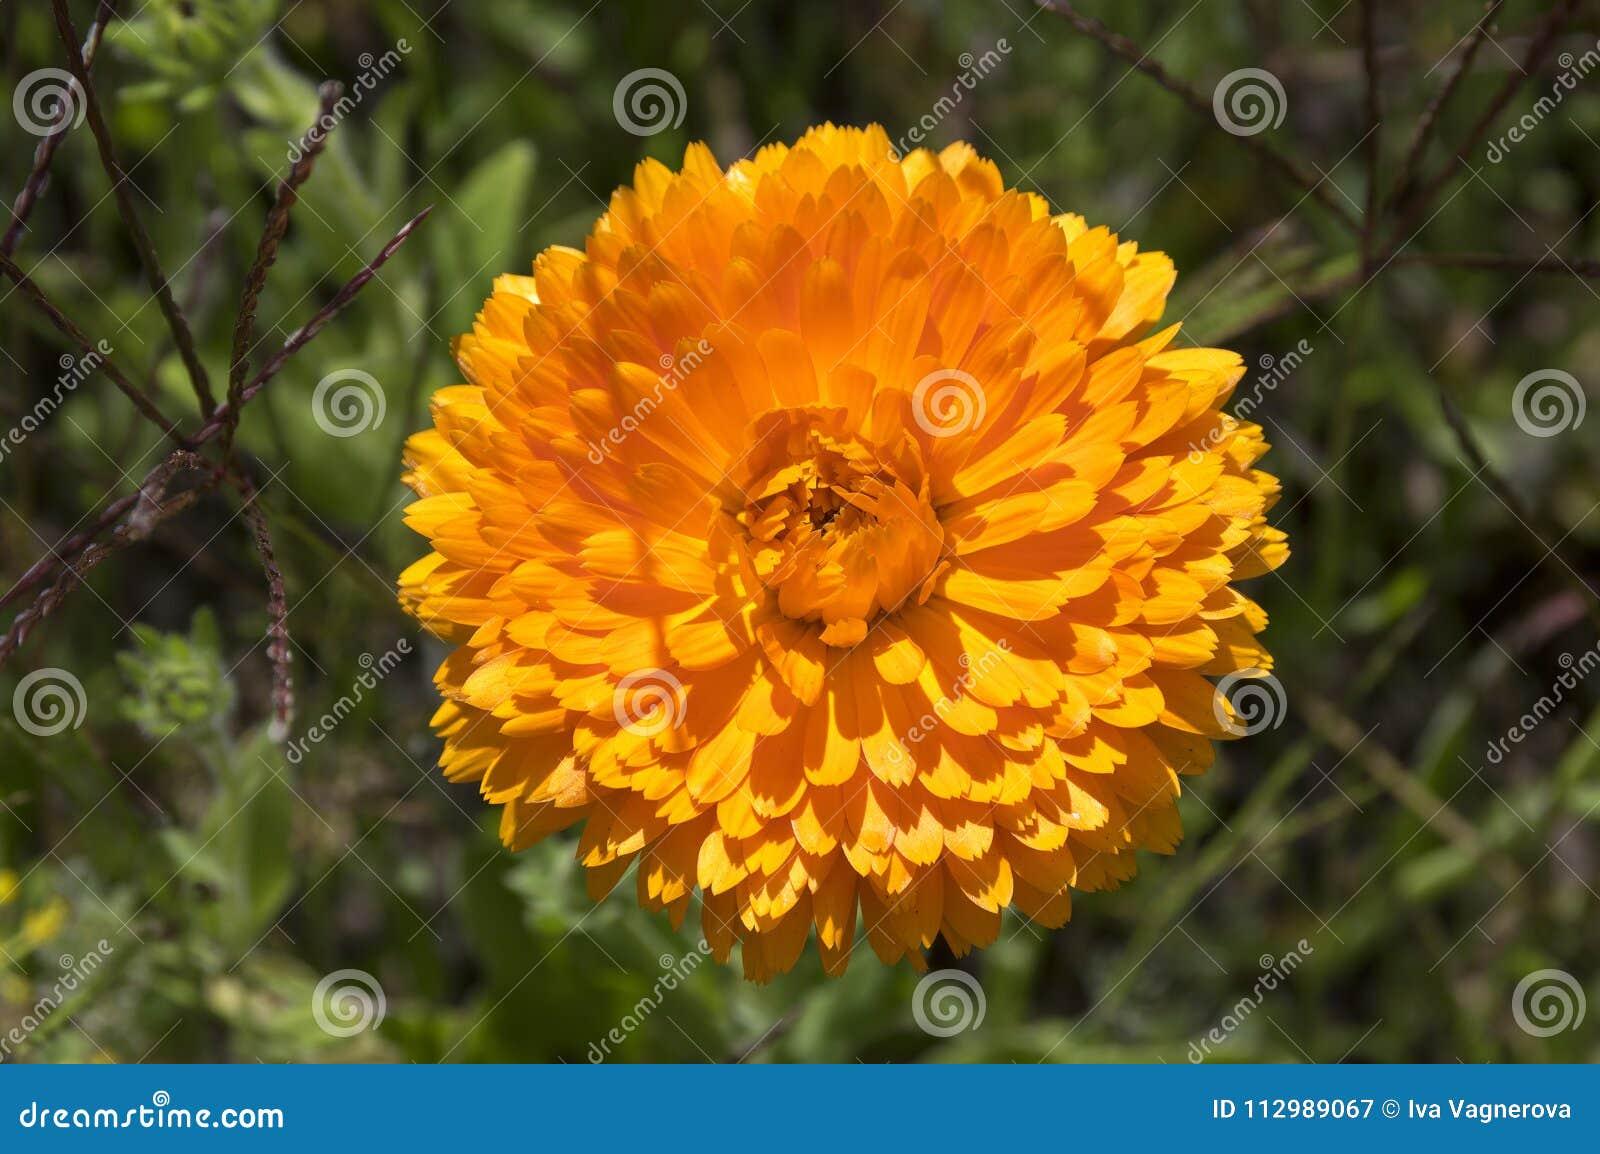 Calendula officinalis flower in bloom